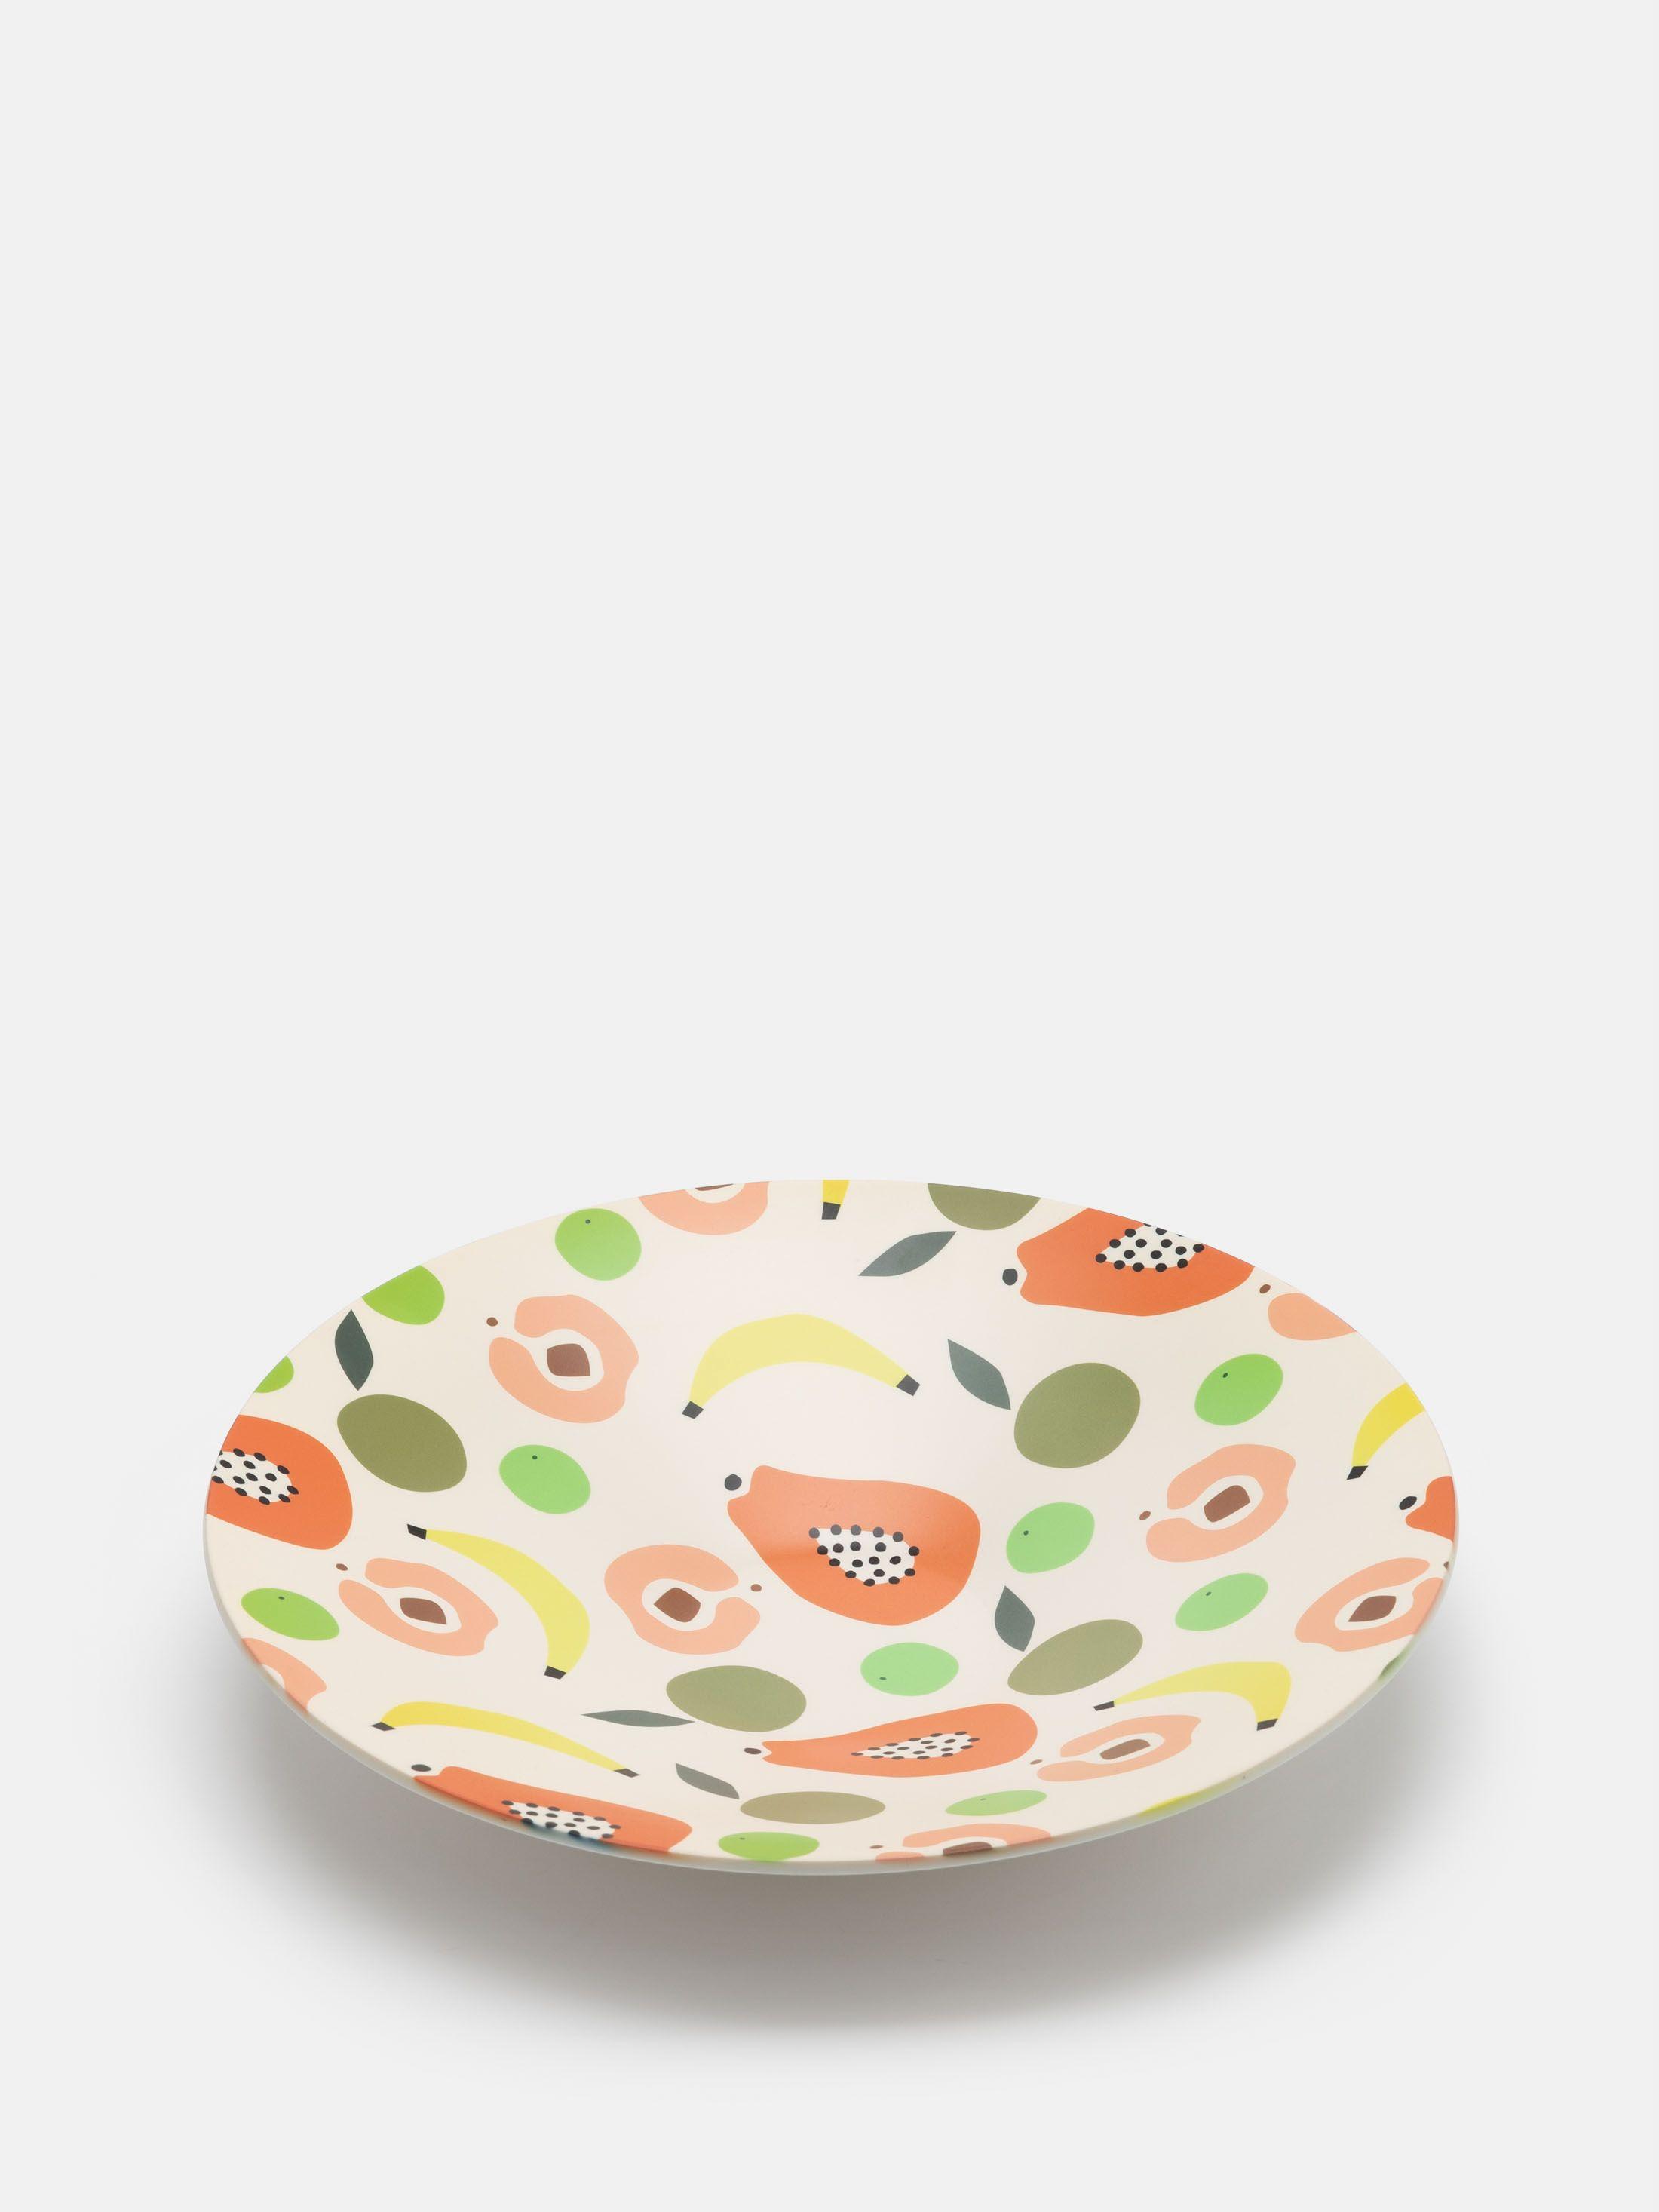 custom bowls